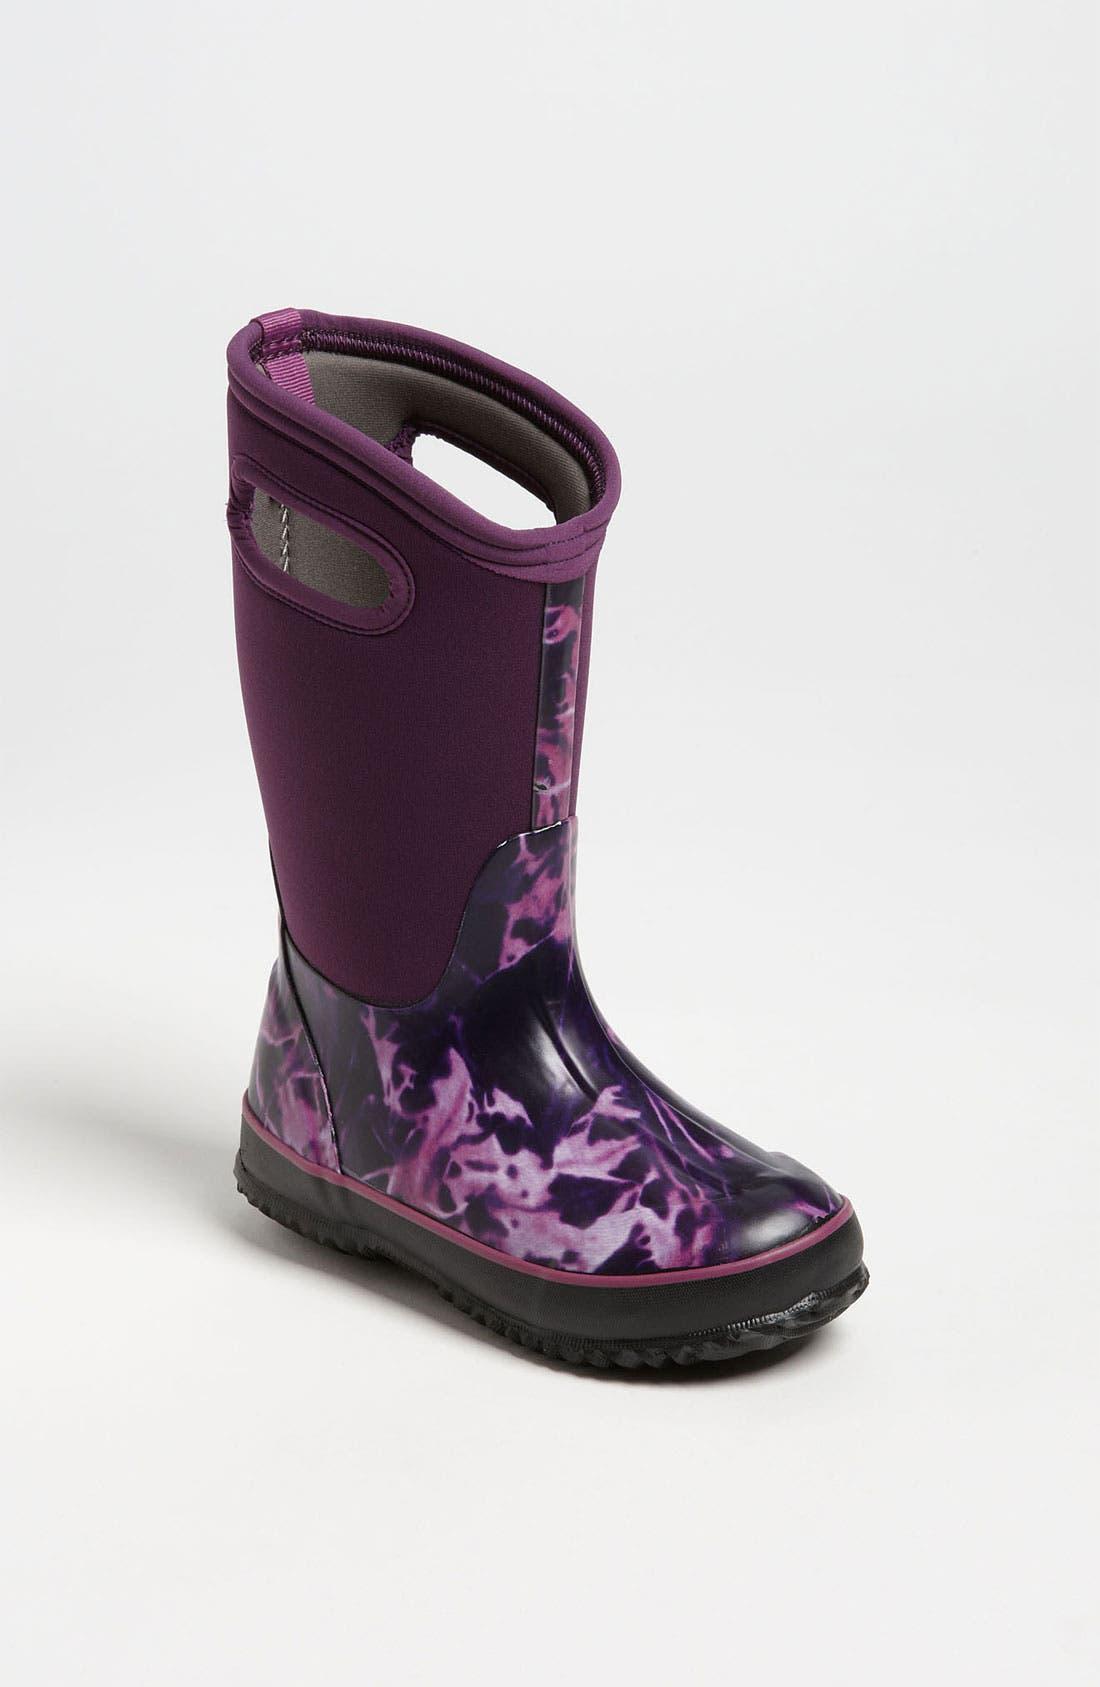 Alternate Image 1 Selected - Bogs 'Classic High - Batik' Waterproof Boot (Toddler, Little Kid & Big Kid)